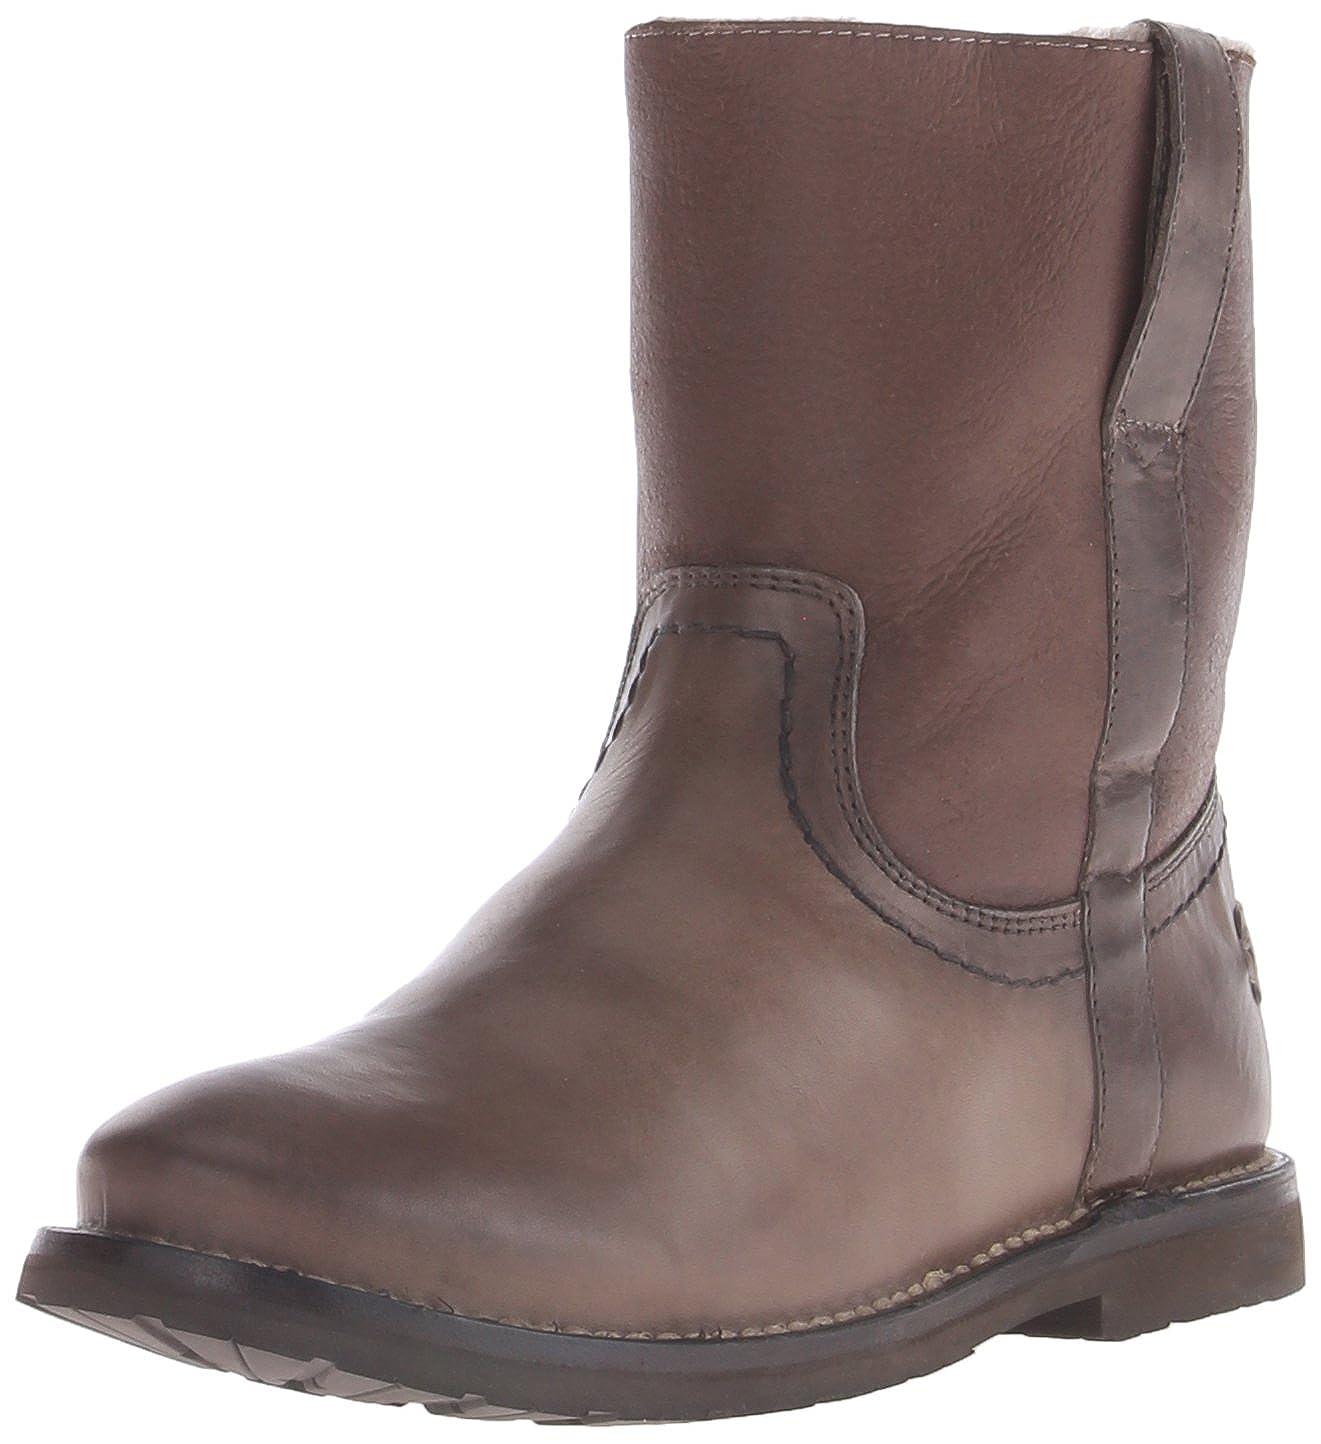 35507bebeac FRYE Women's Celia Shearling Short Winter Boot